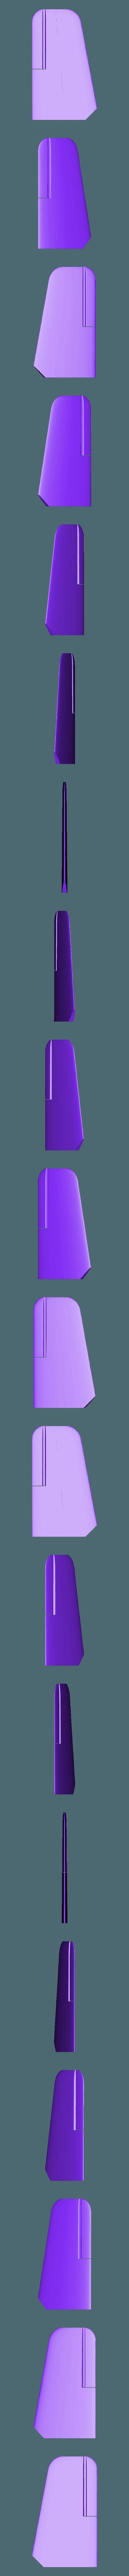 Right_Rear_Stabilizer.stl Download free STL file Flyer Mk. 1 • 3D printing object, billbo1958